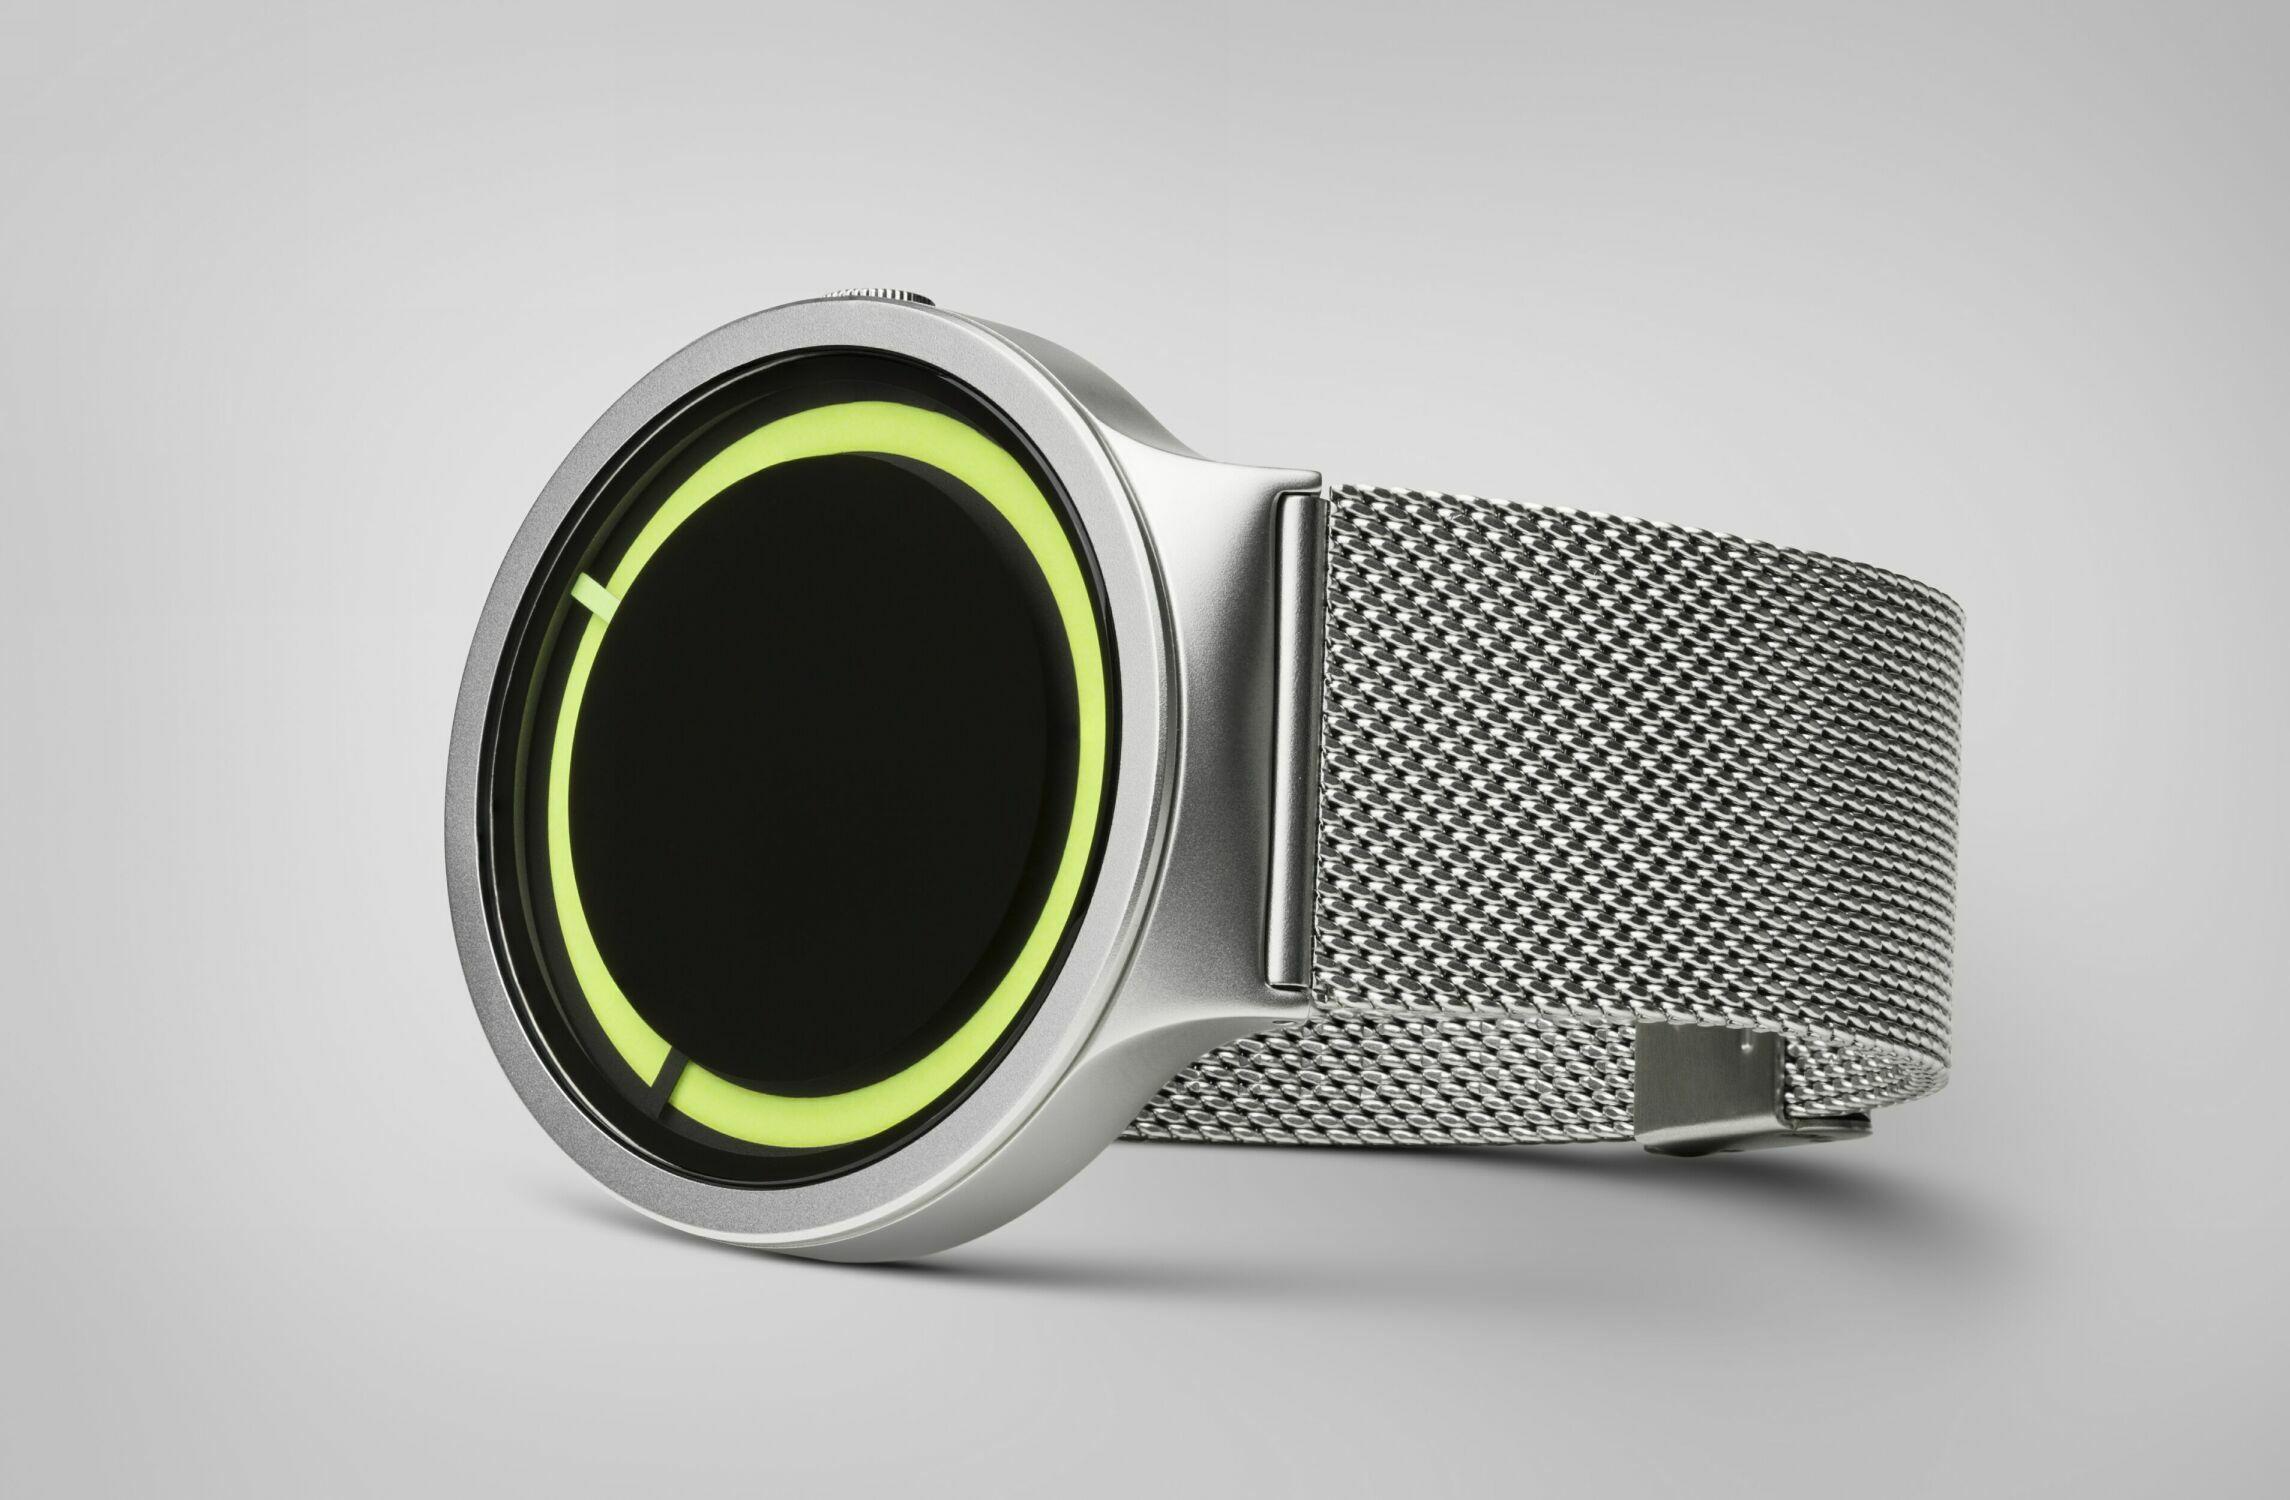 Пинкл (Pinkl) | Ziiiro Eclipse Metalic Chrome Lemon | Ziiiro Eclipse Metalic Chrome Lemon